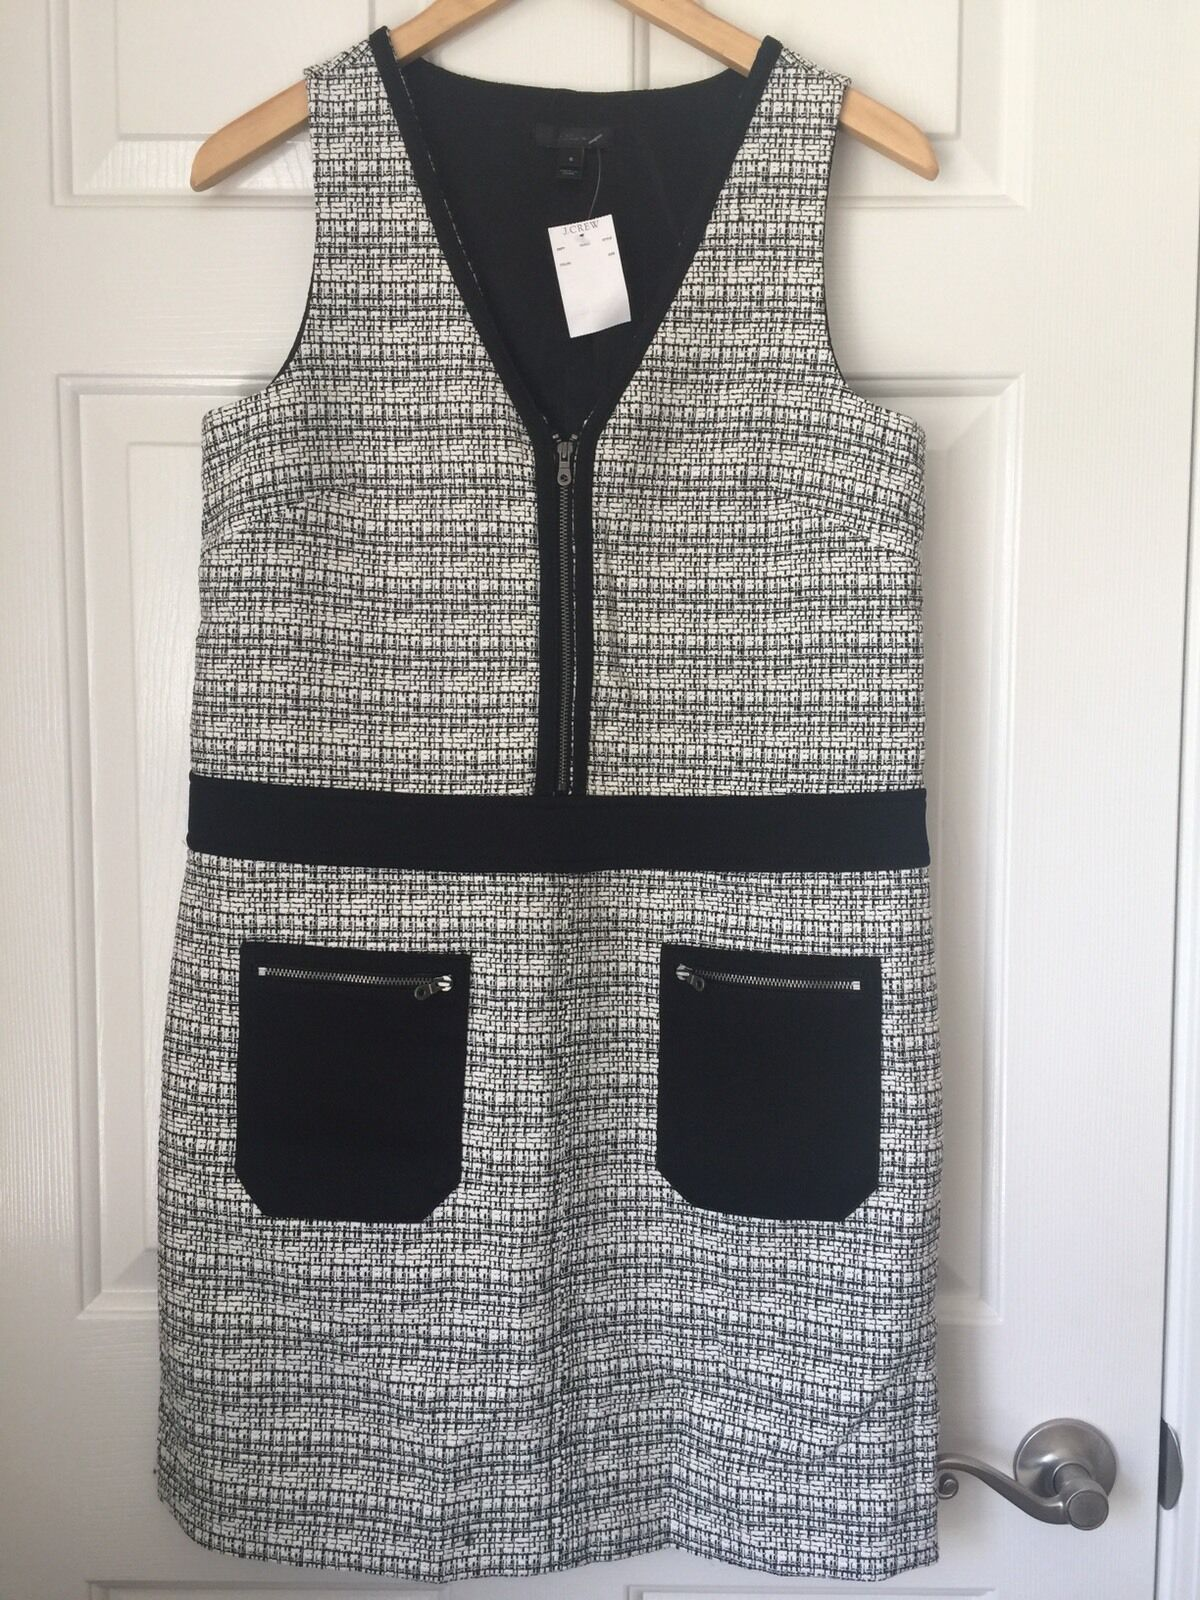 J Crew New grau schwarz Woven Dress Größe 6